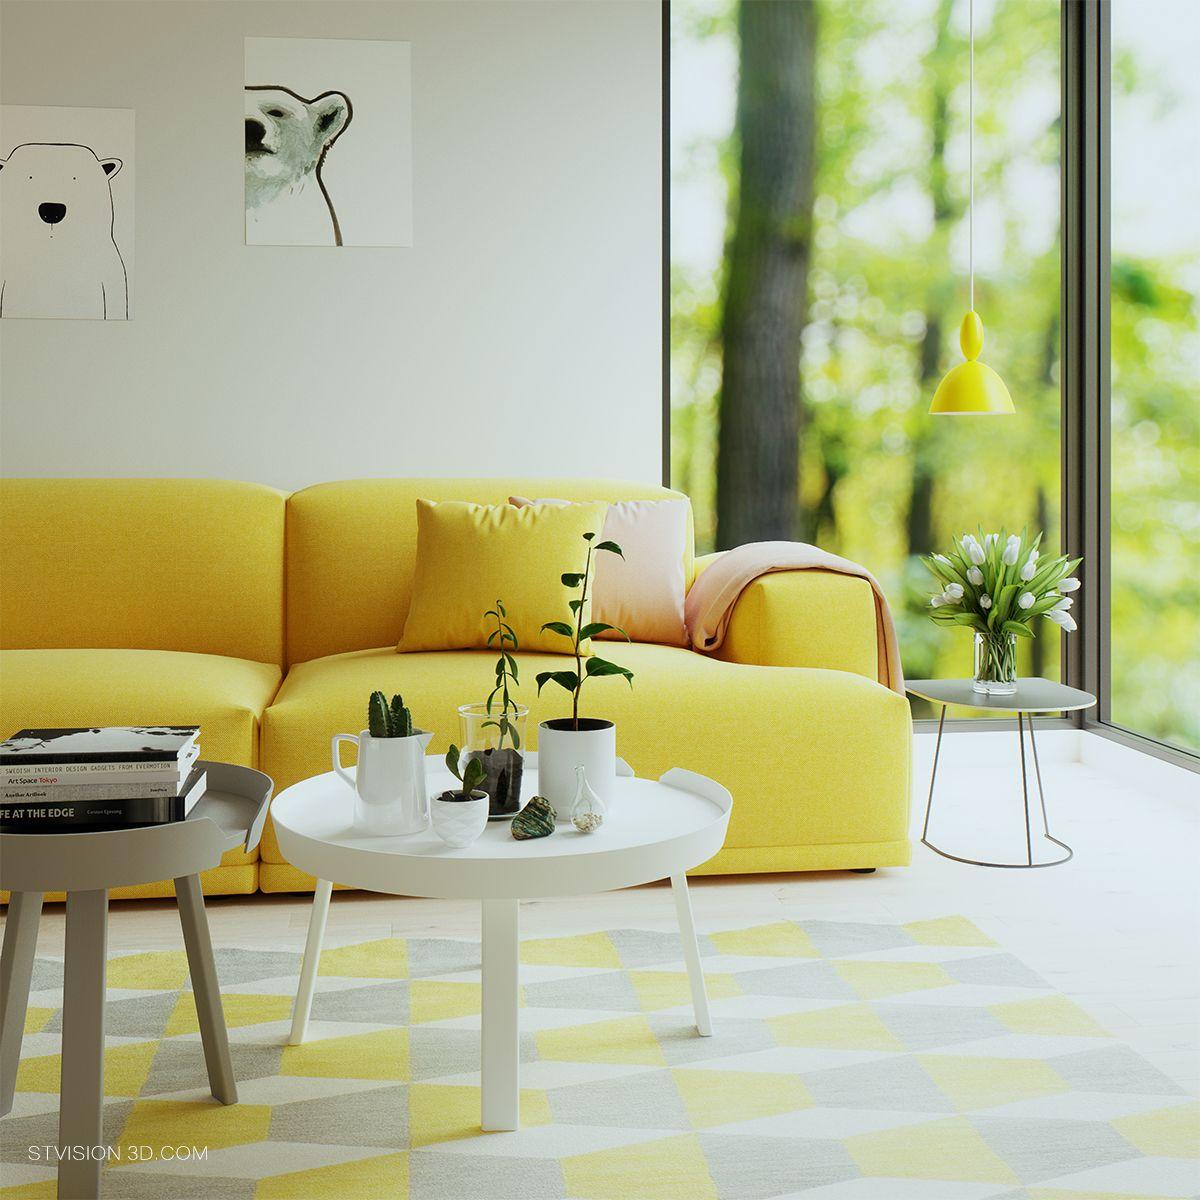 stvision-YM-Yellow-Sofa_01